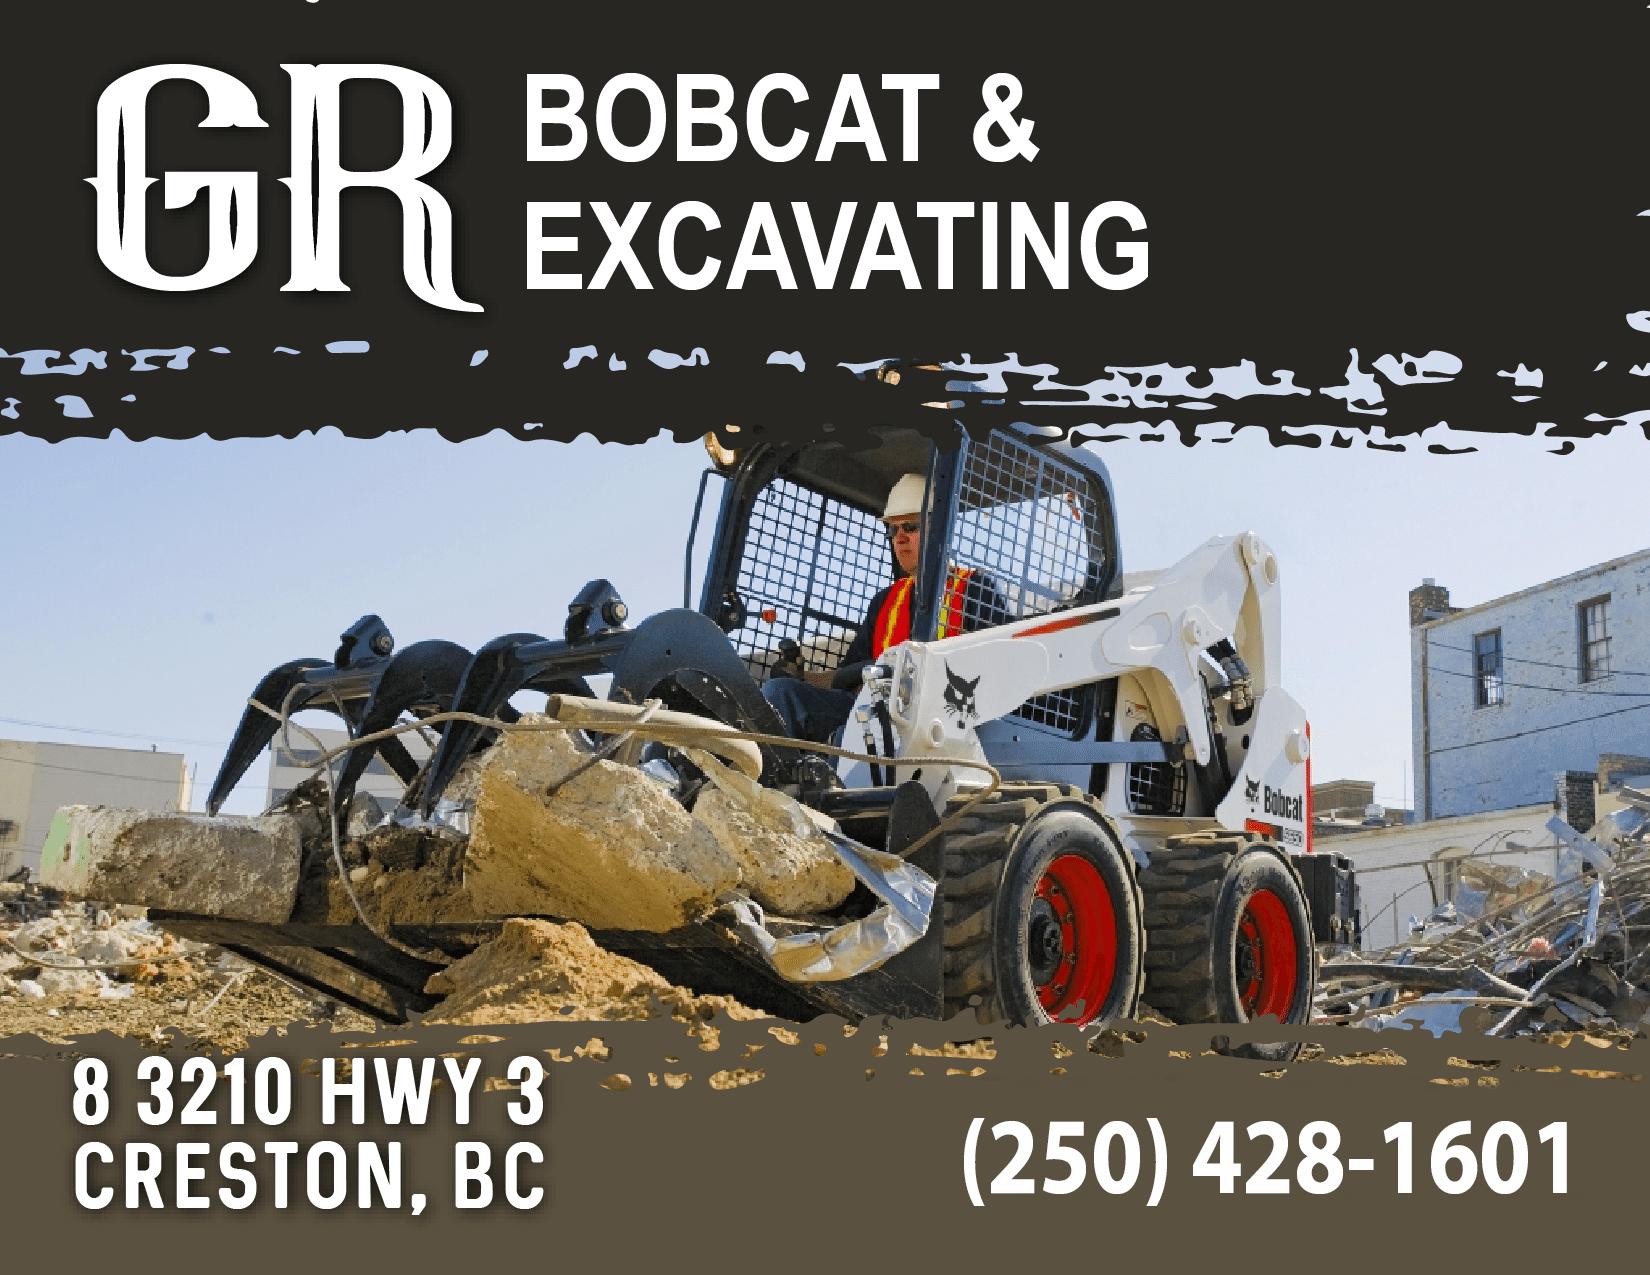 GR Bobcat & Excavating